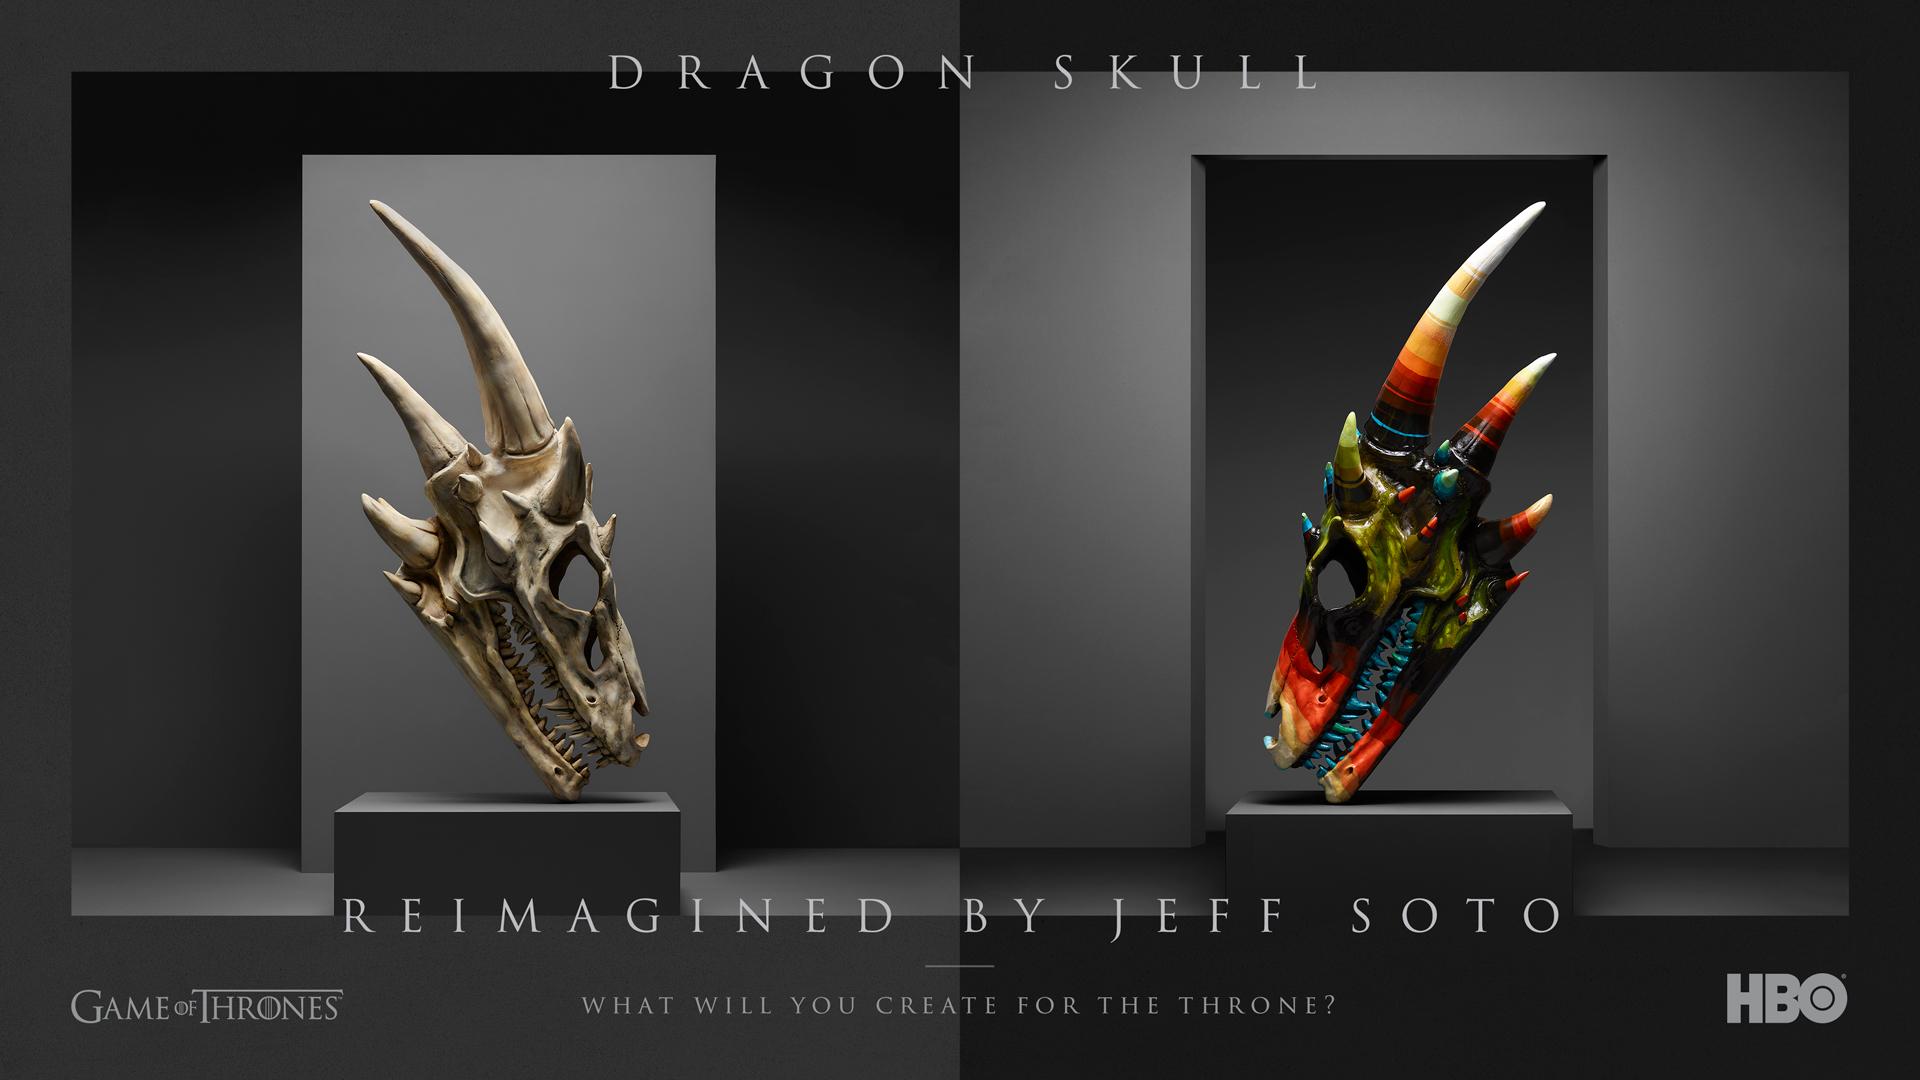 01_FIRE_Dragon_Skull_Jeff_Soto.jpg